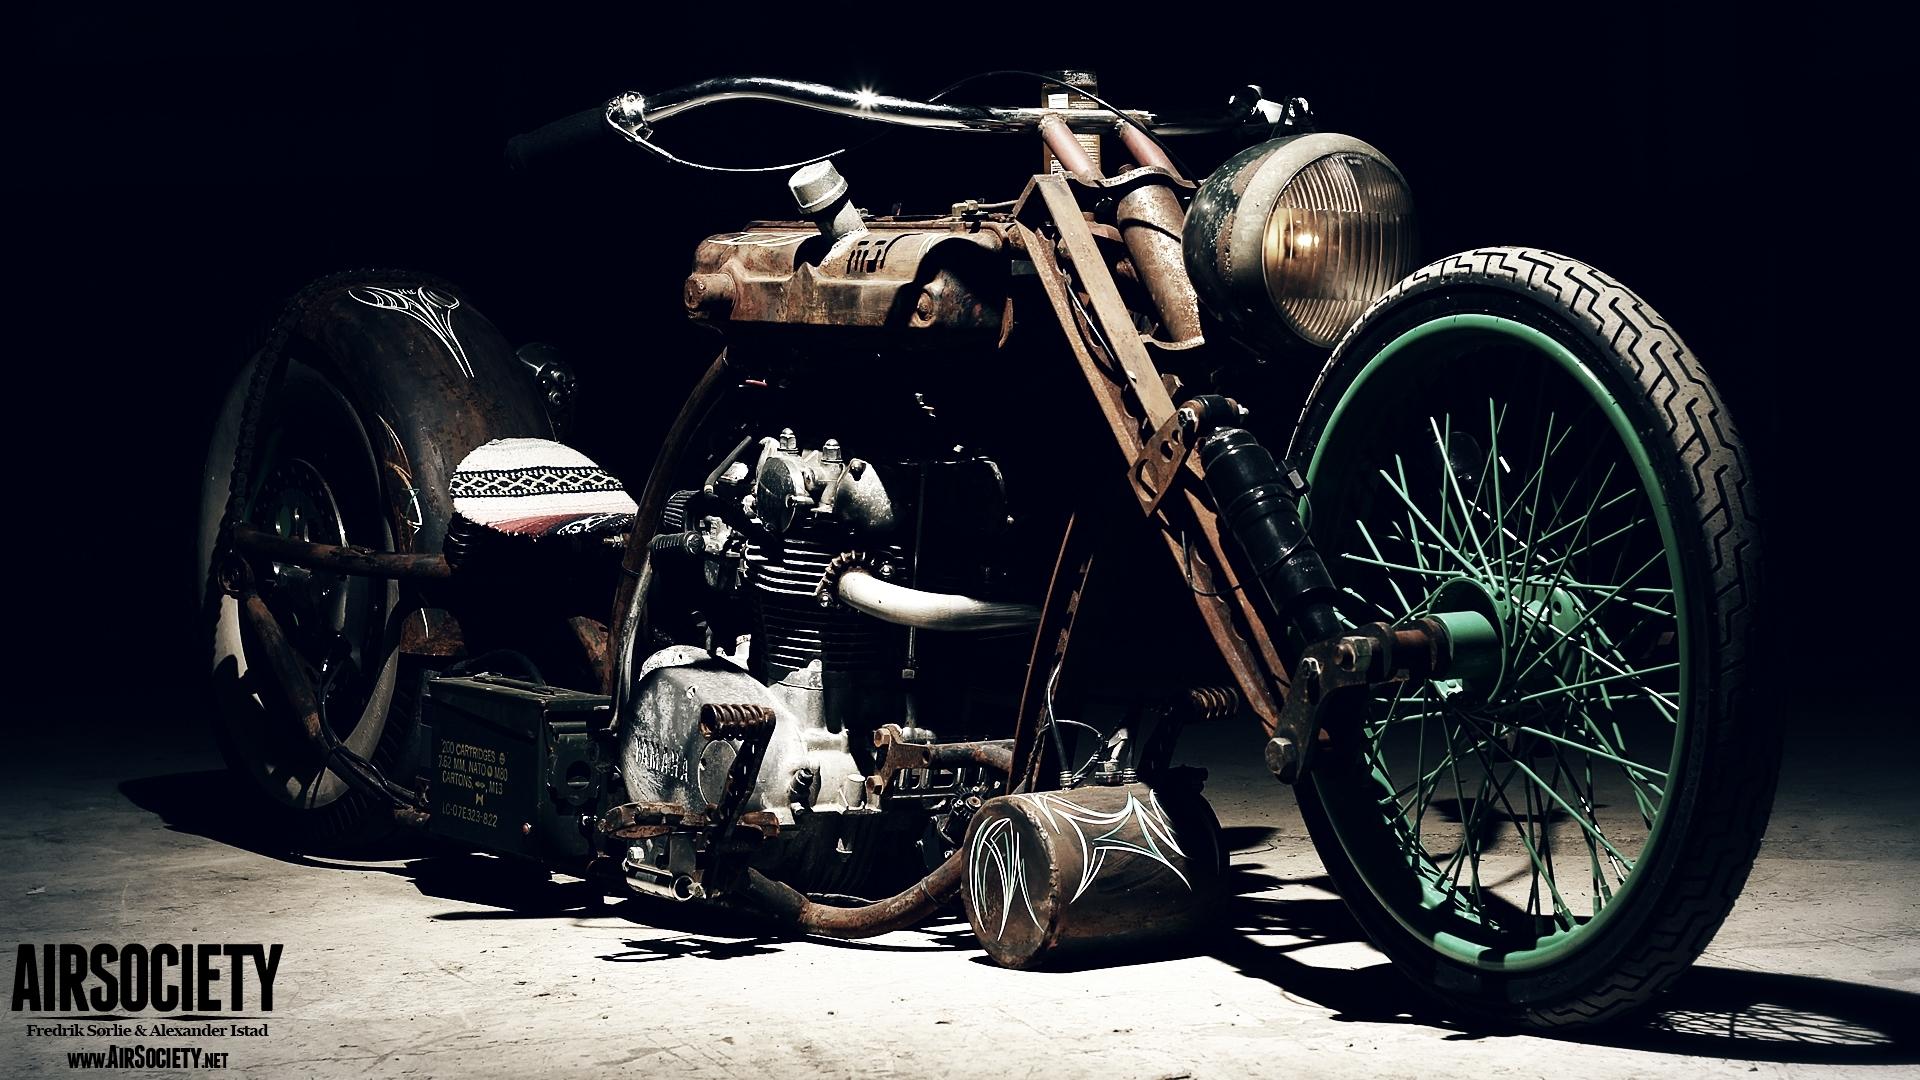 bobber motorcycle background